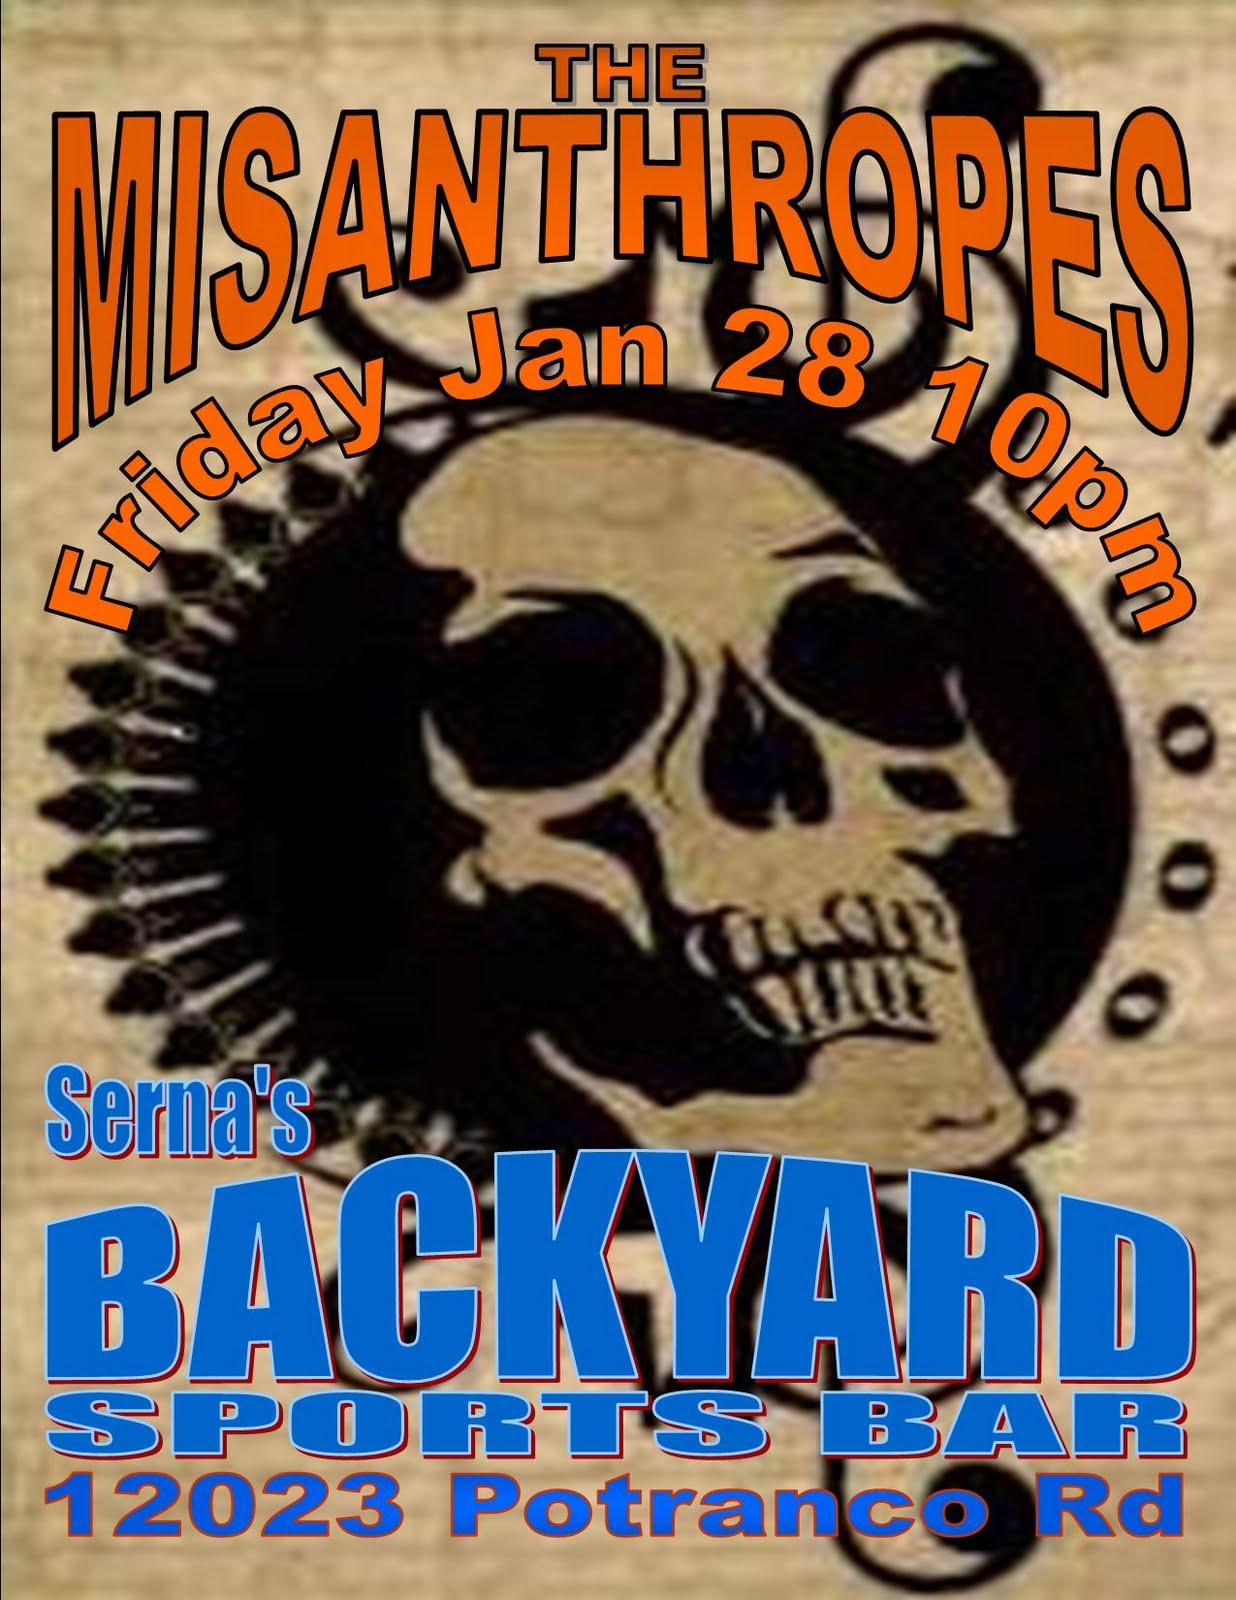 the misanthropes serna 39 s backyard sports bar friday jan 28th